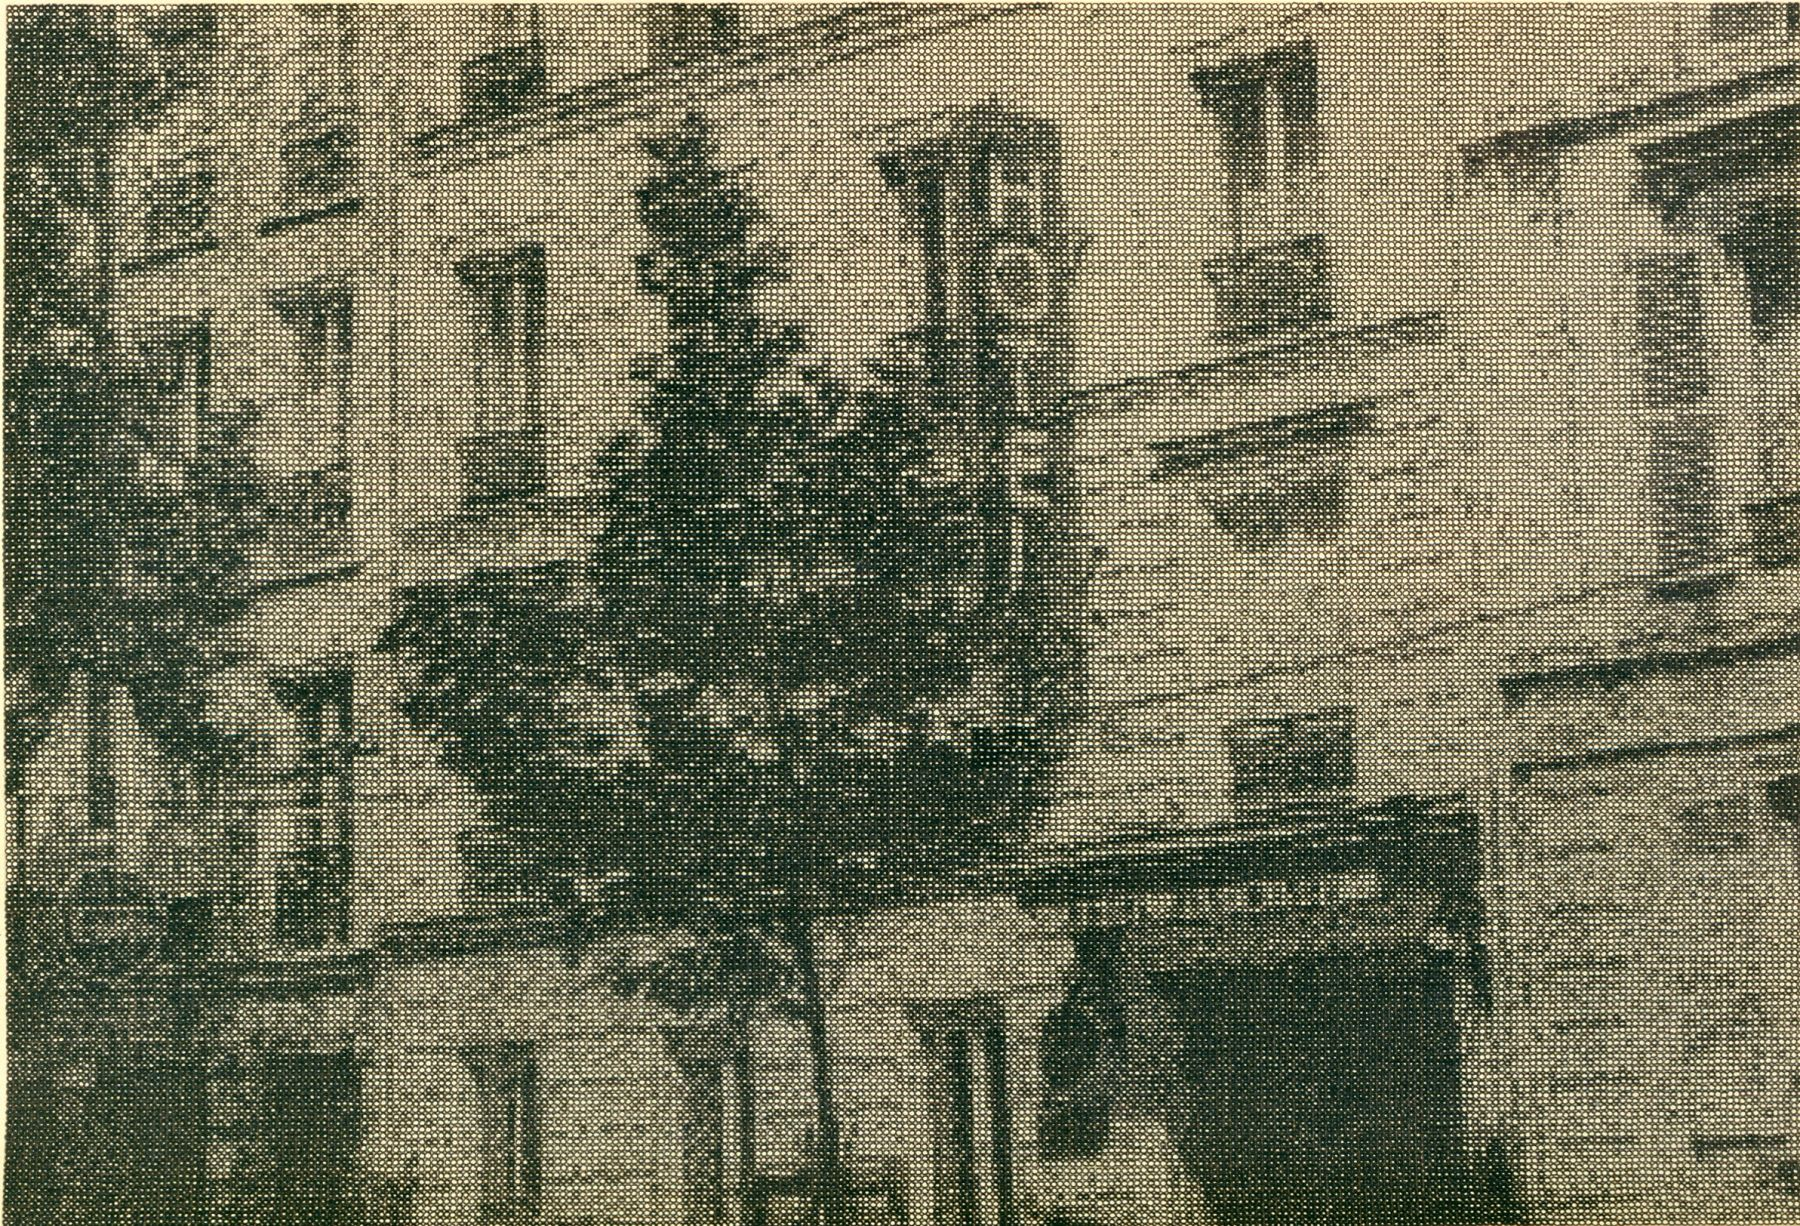 Ewan Gibbs Hotel Ink on paper